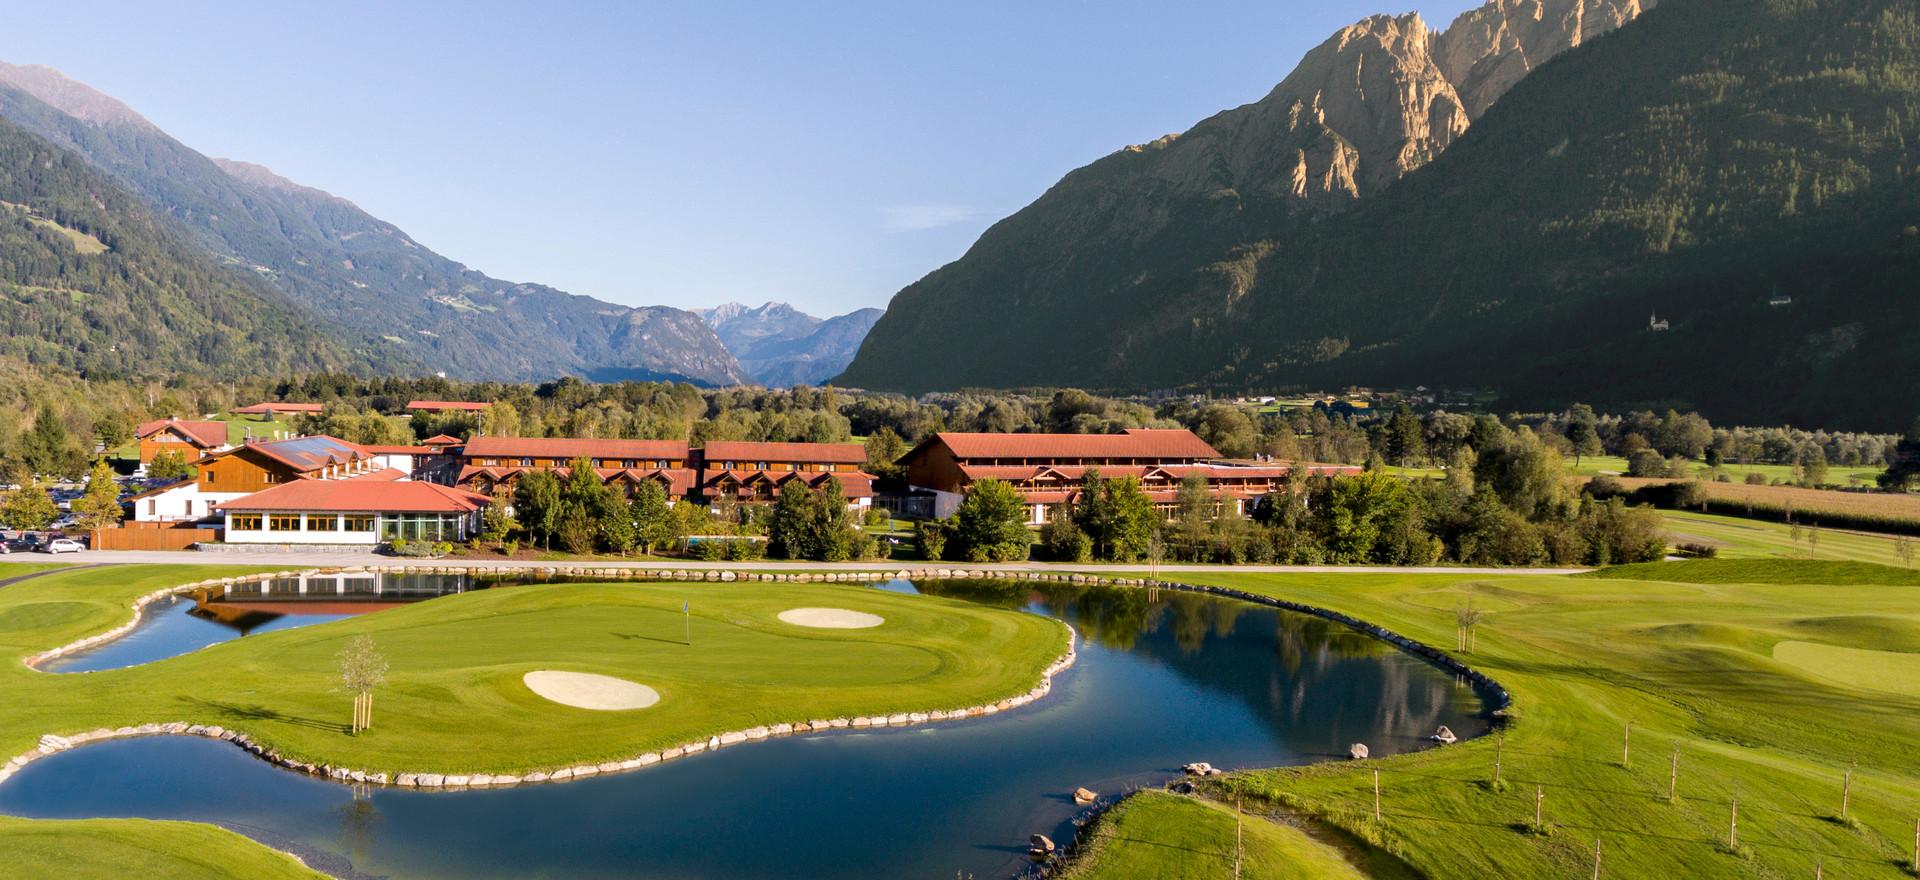 Dolomitengolf Hotel_Spa.jpg